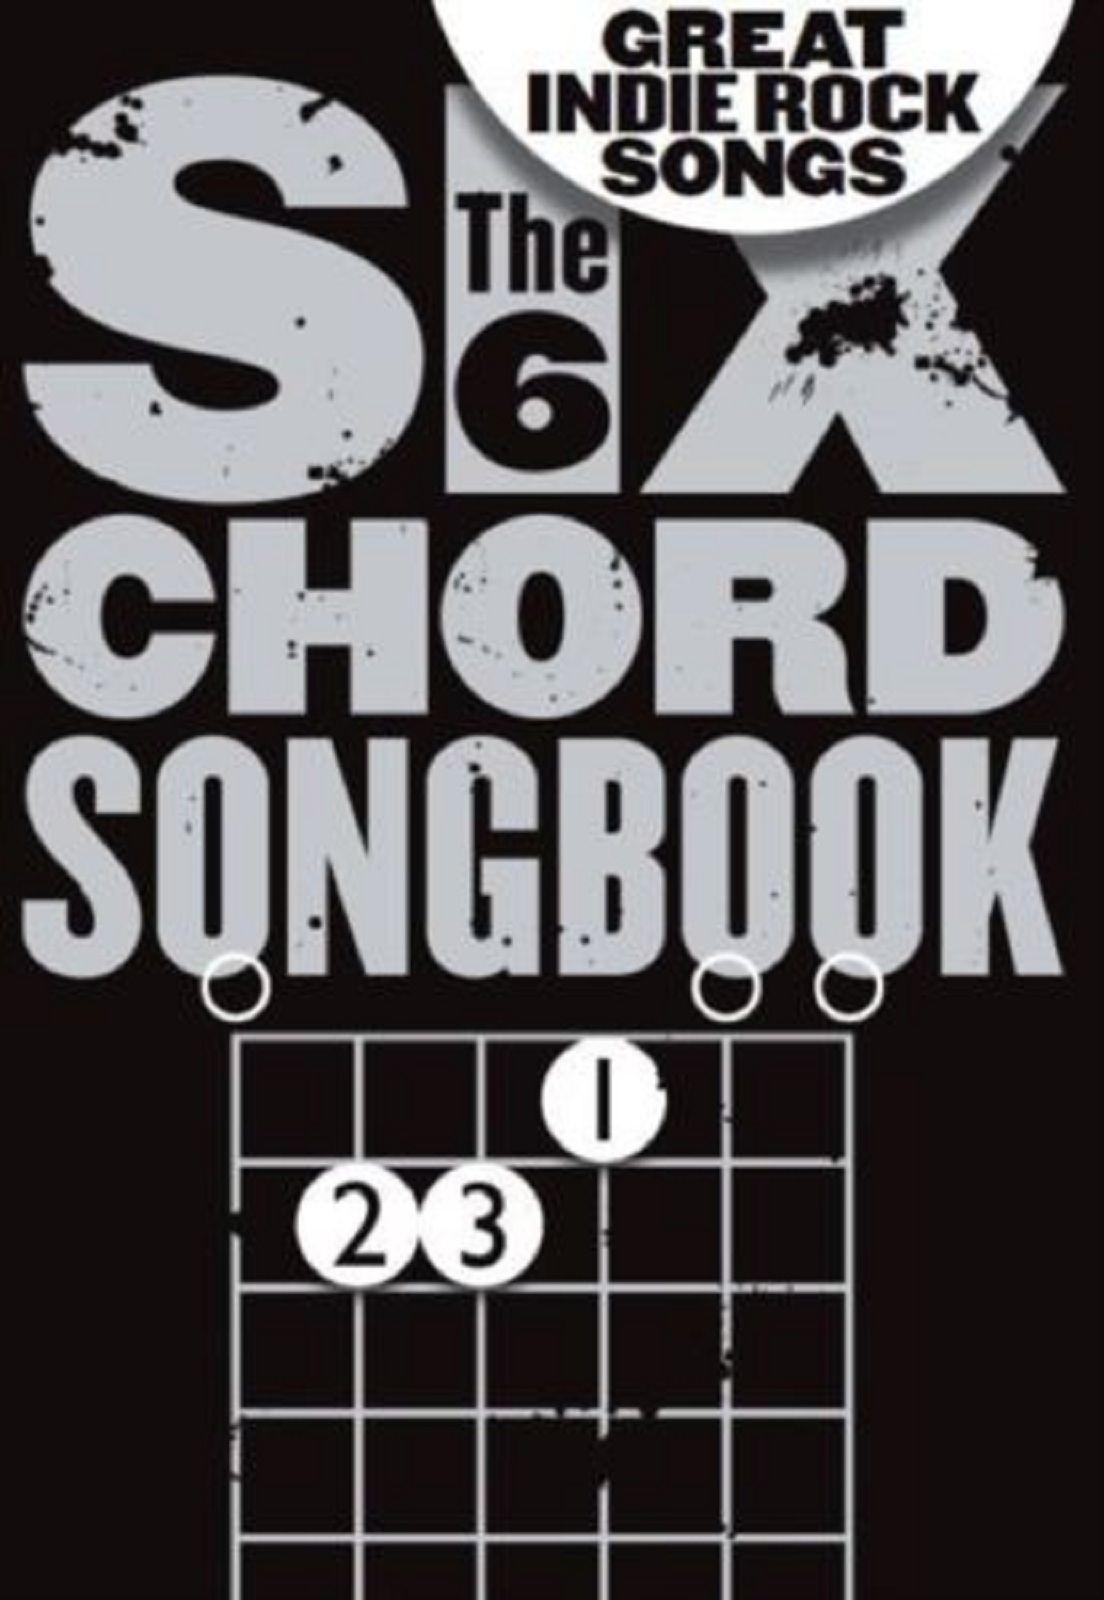 The Six Chord Songbook Great Indie Rock Songs Guitar Chords Lyrics Book S171